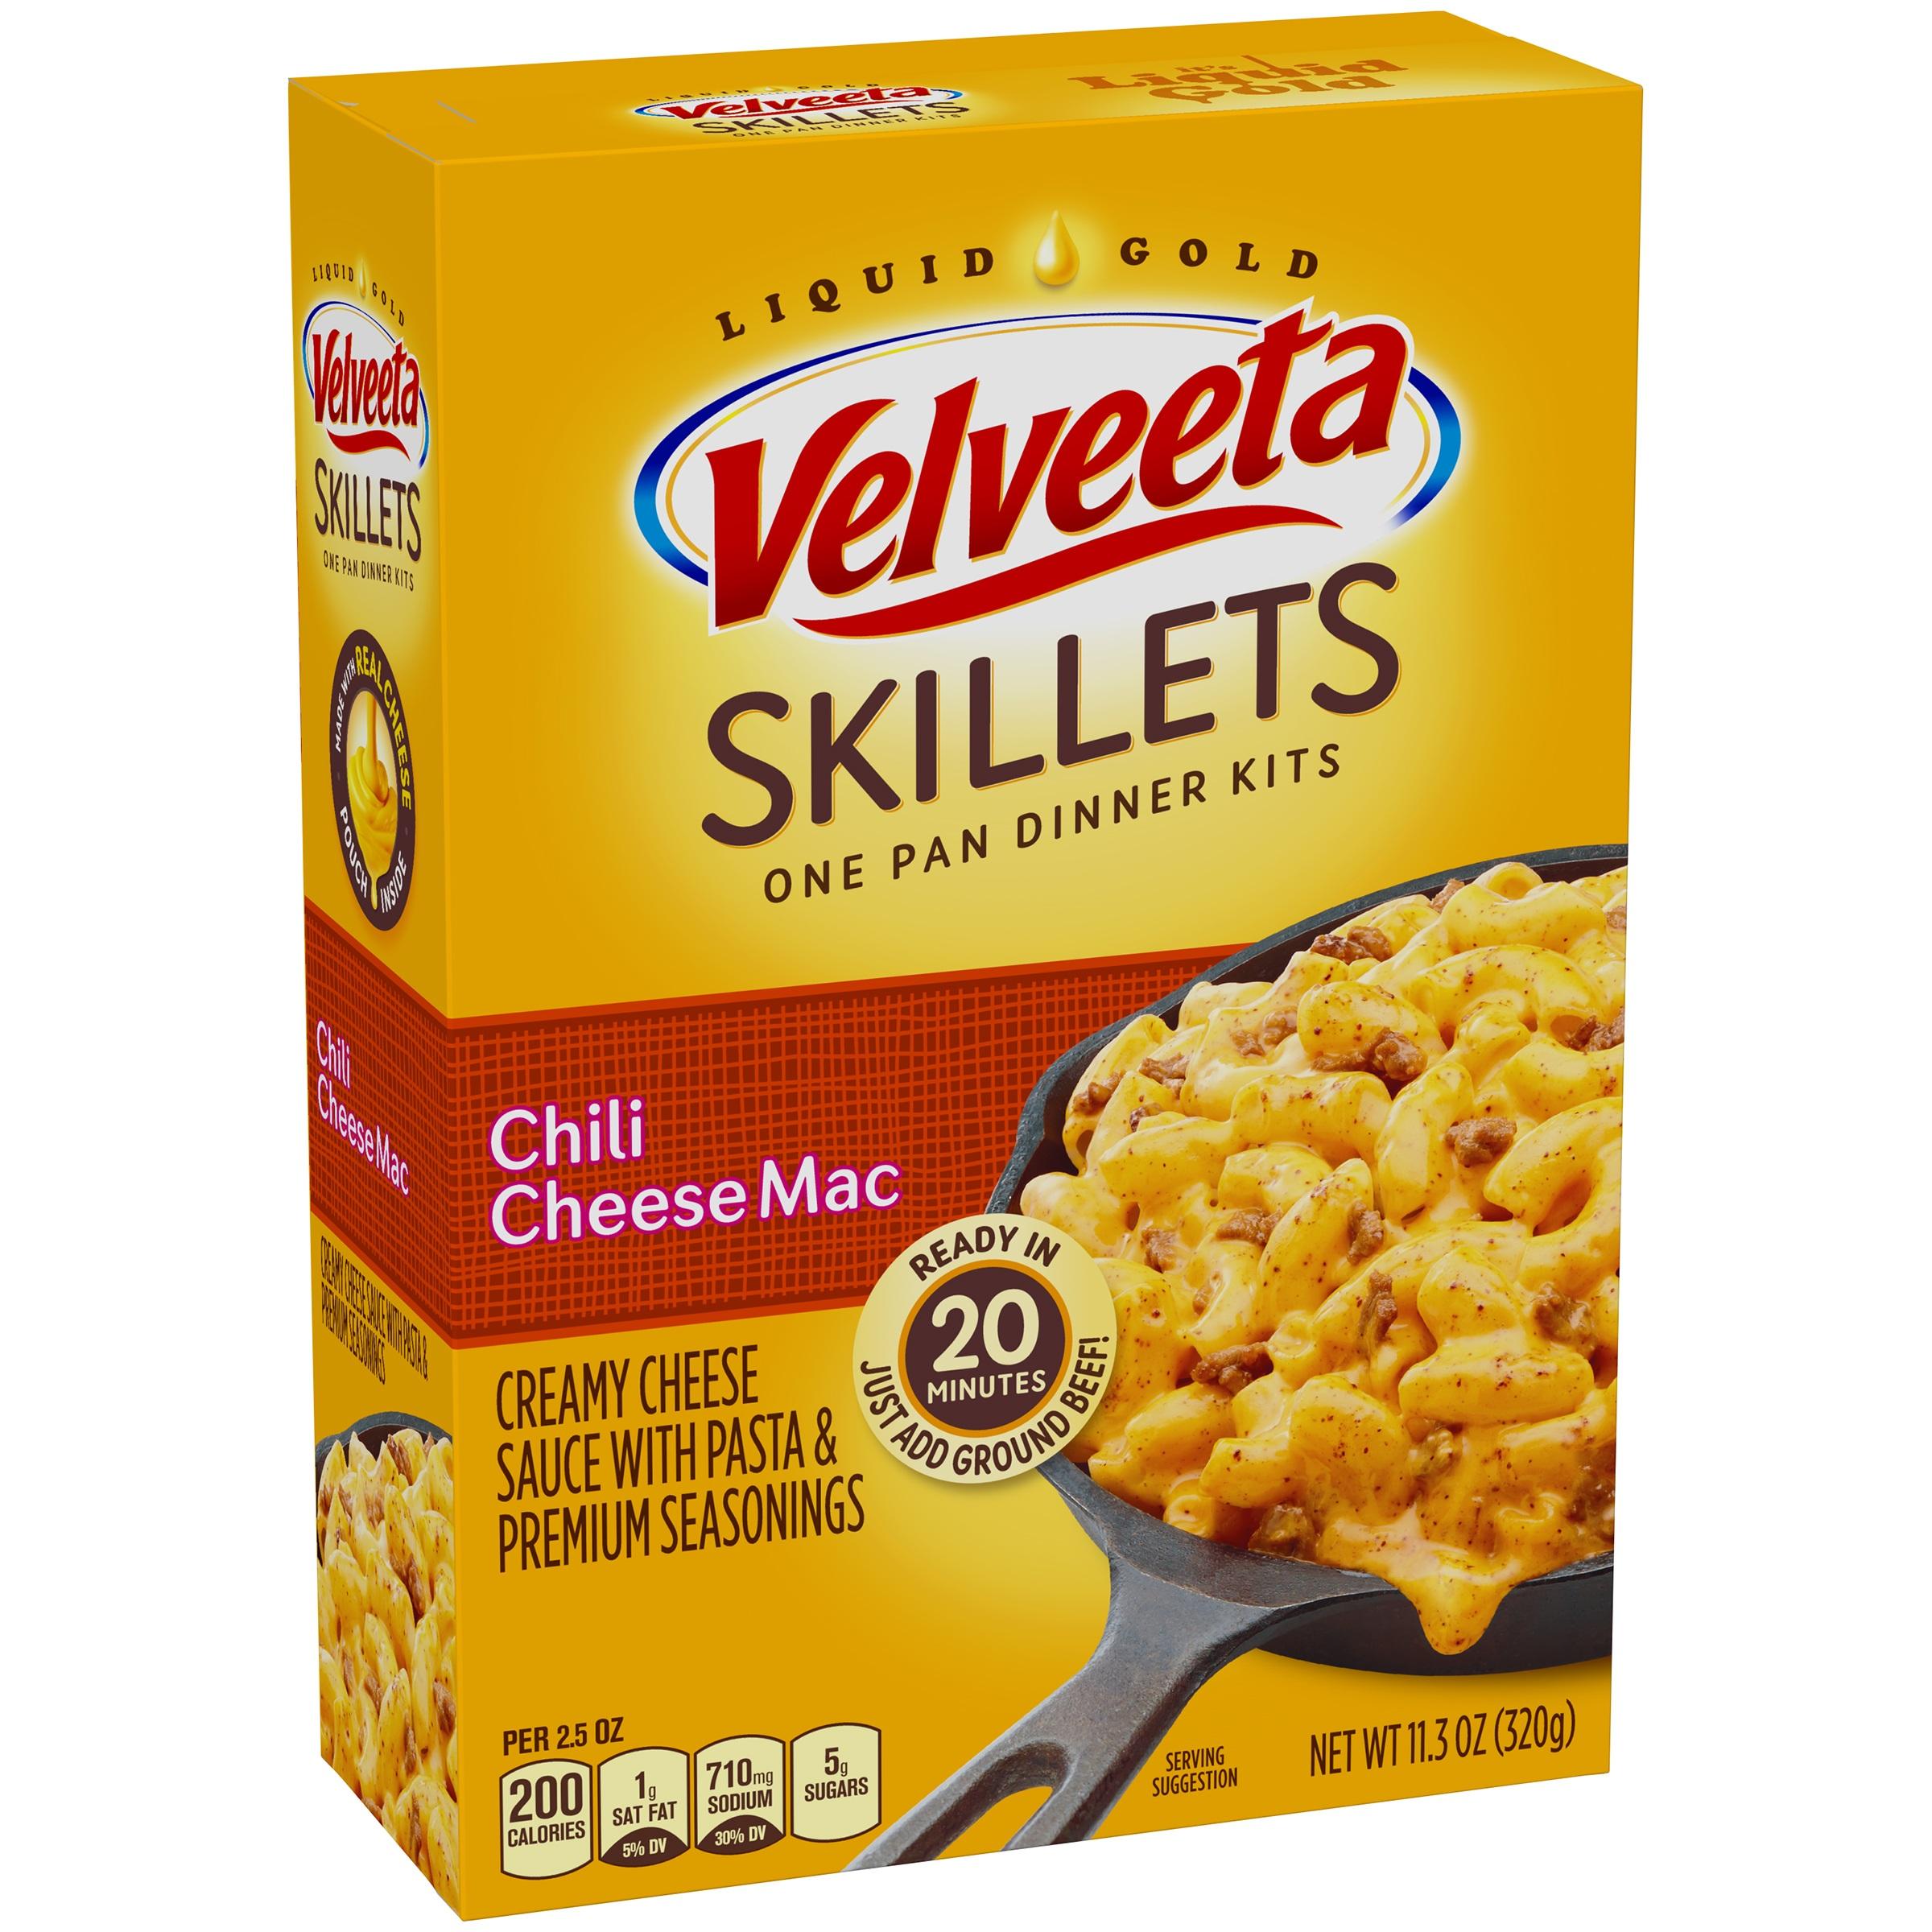 Velveeta Skillets Chili Cheese Mac One Pan Dinner Kit 11.3 oz. Box